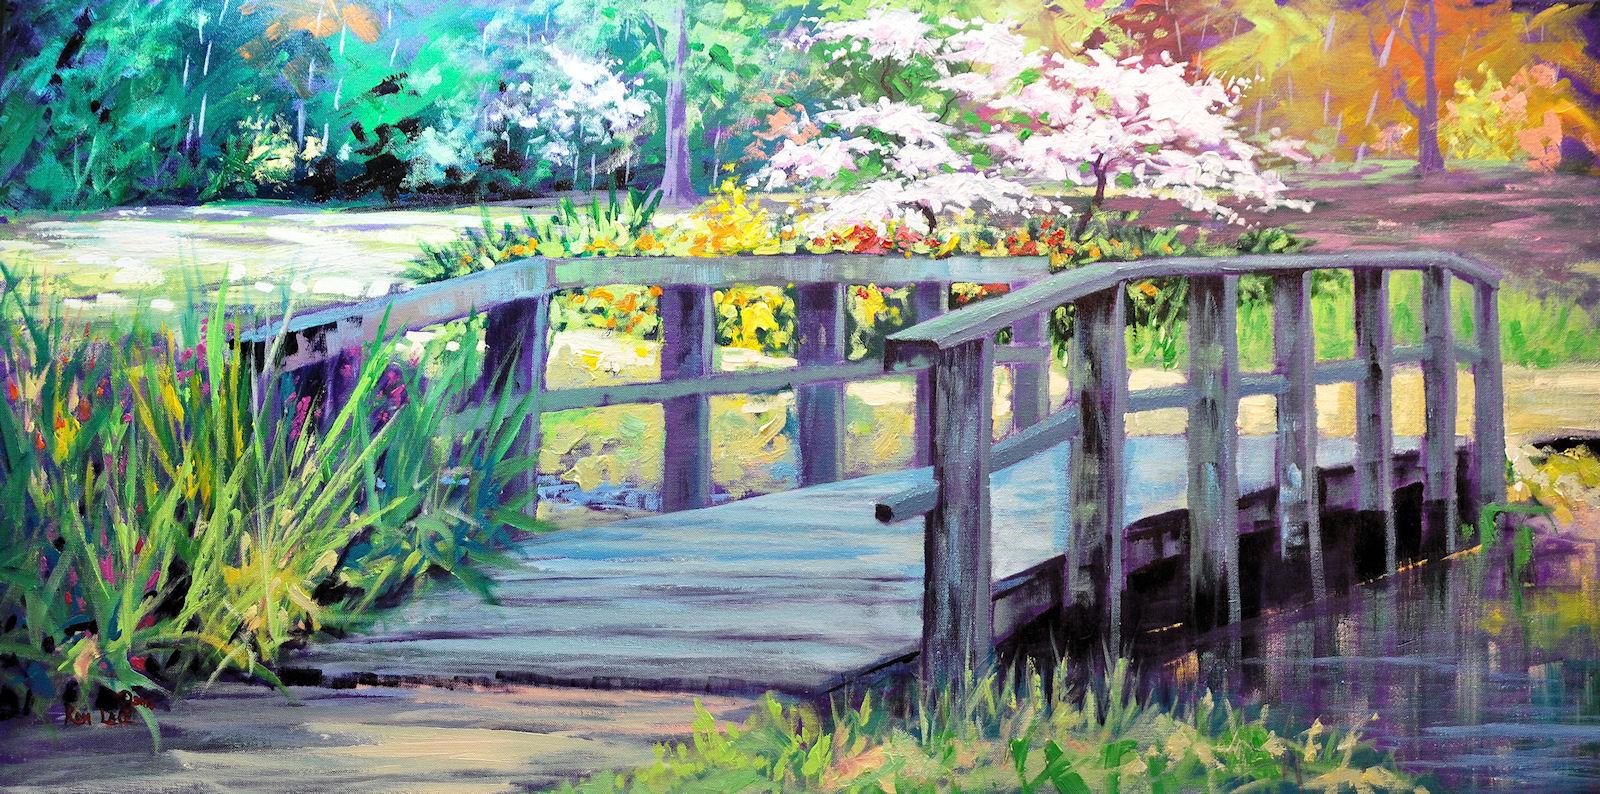 Bridge-Memphis Botanic Gardens